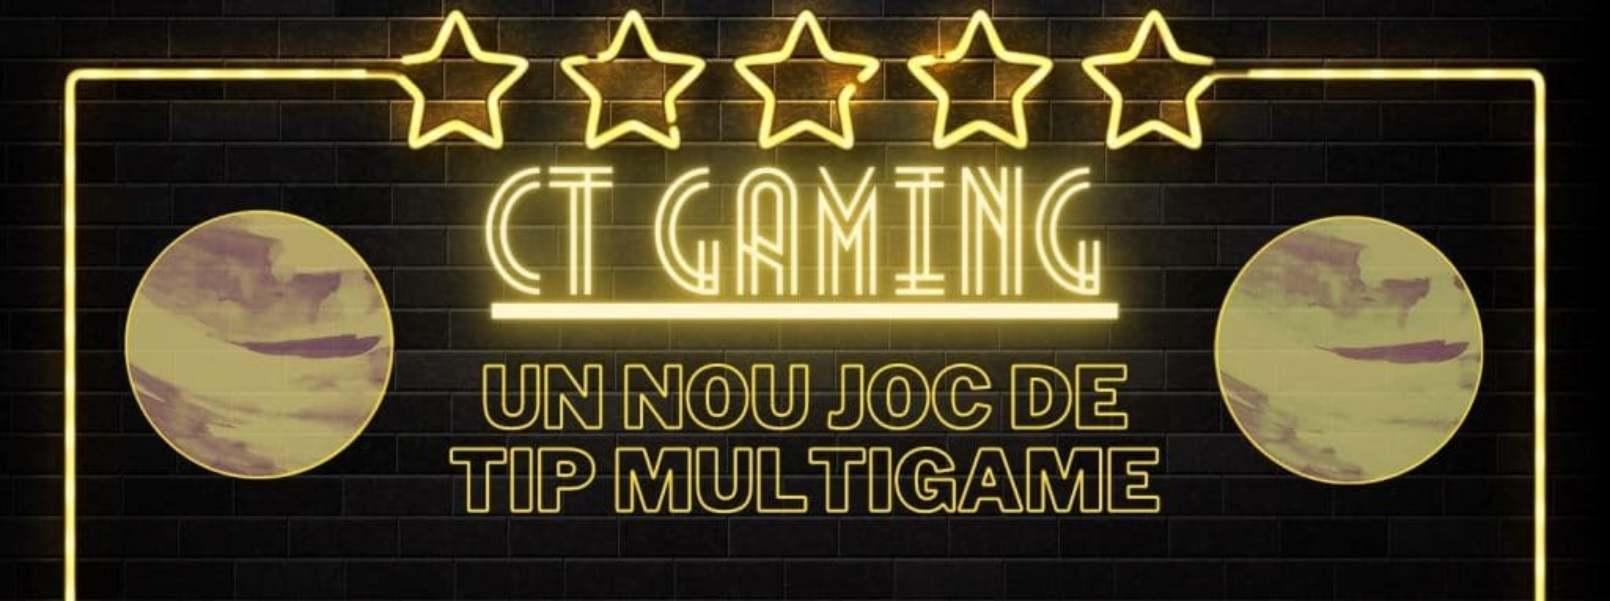 joaca ct gaming romania multigame